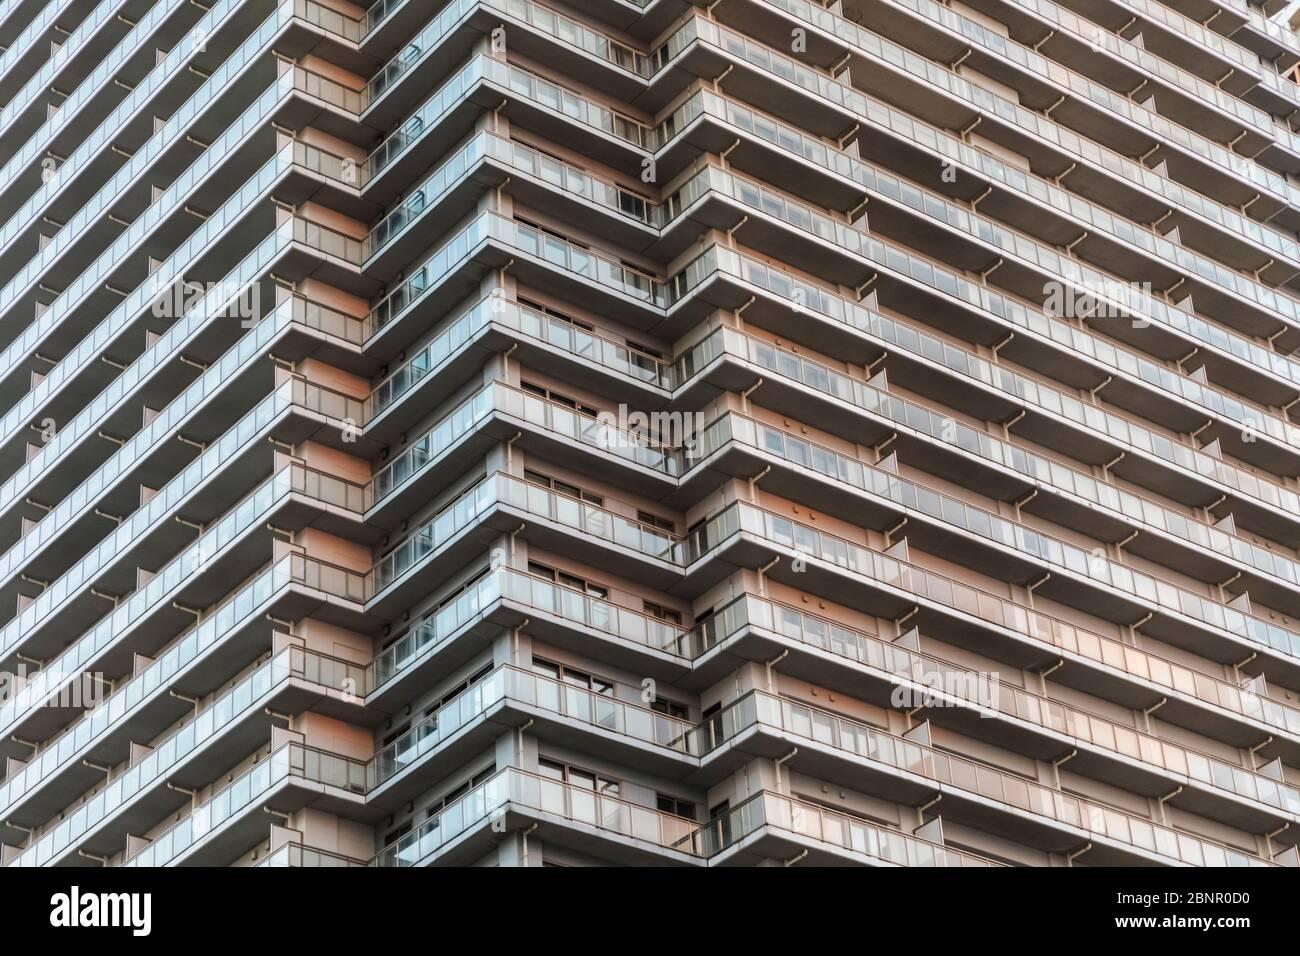 Japan, Honshu, Tokyo, Toyosu, Shinonome Waterfront High-rise Apartments Blocks Stock Photo